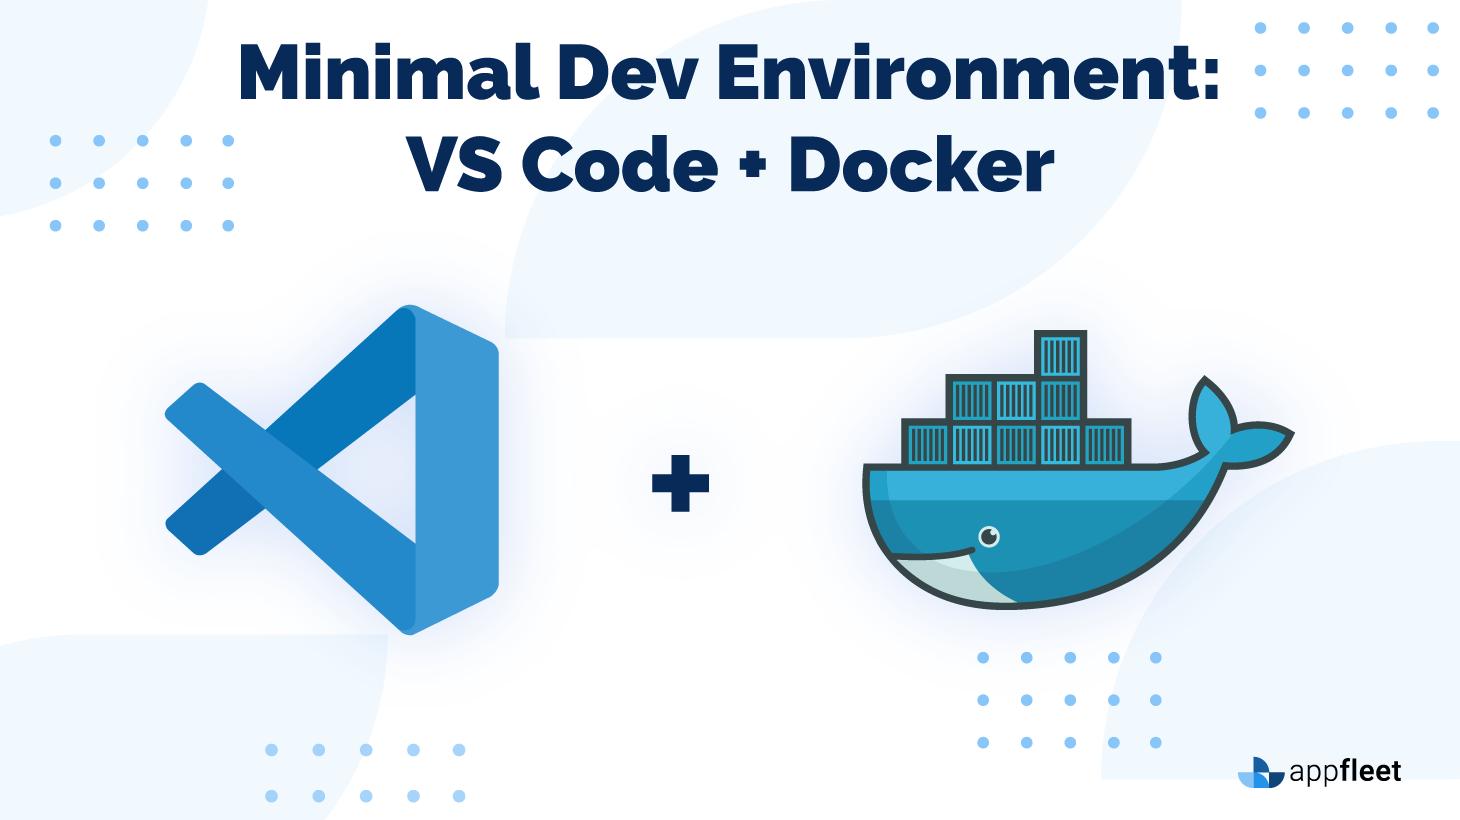 Minimal Dev Environment: VS Code + Docker